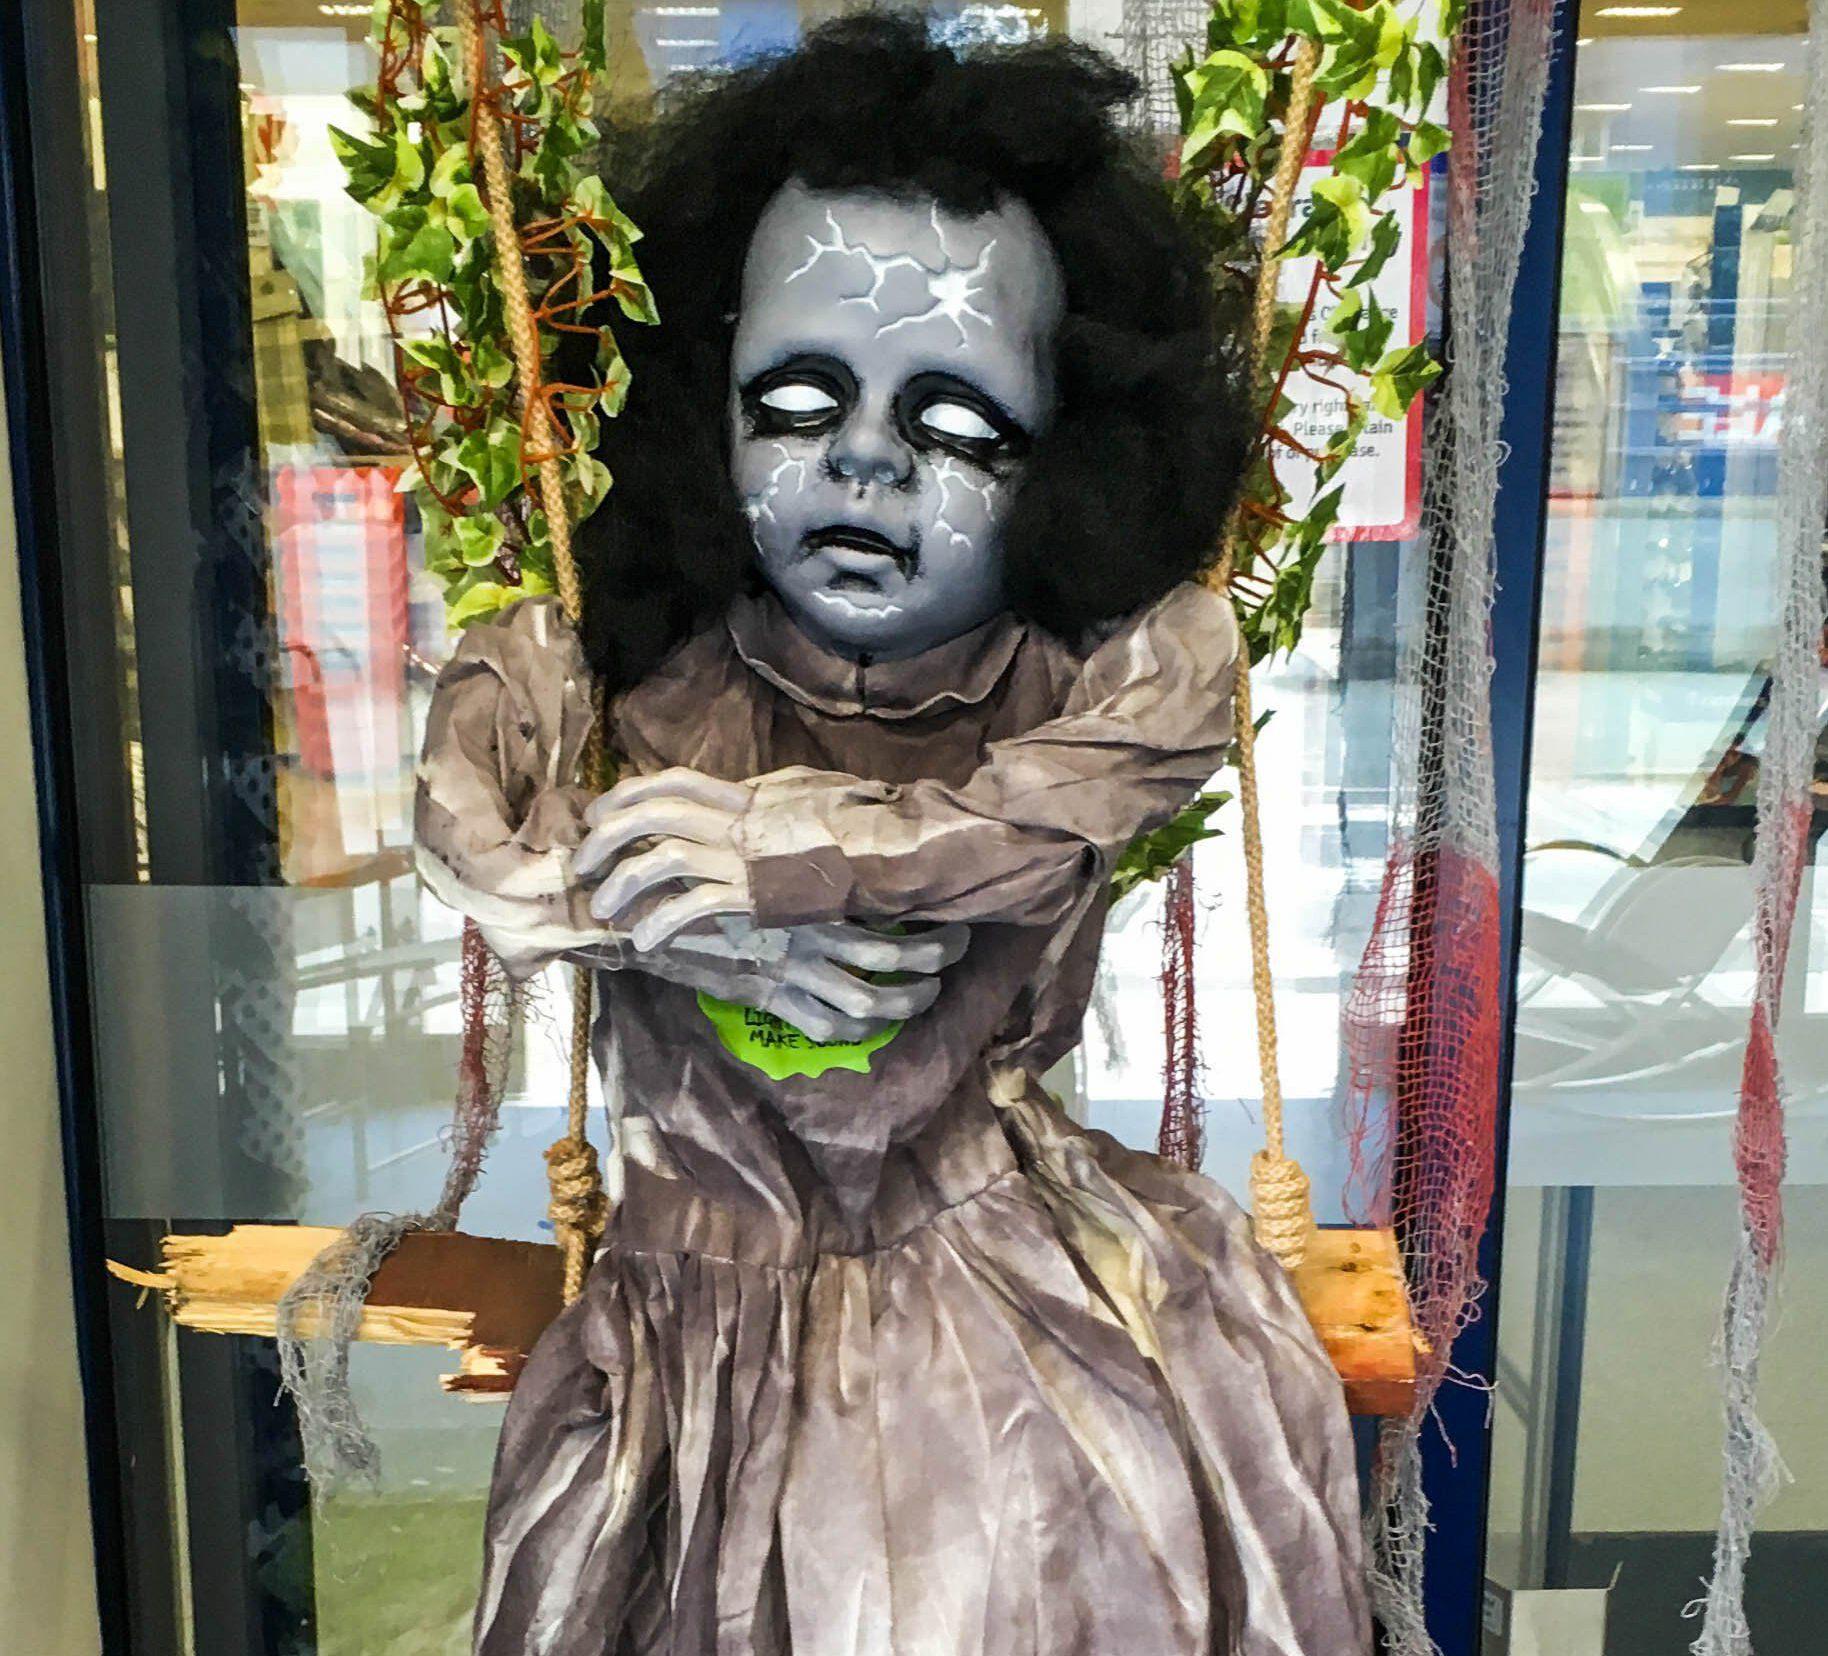 Shop slammed for displaying 'dead child' in Halloween window